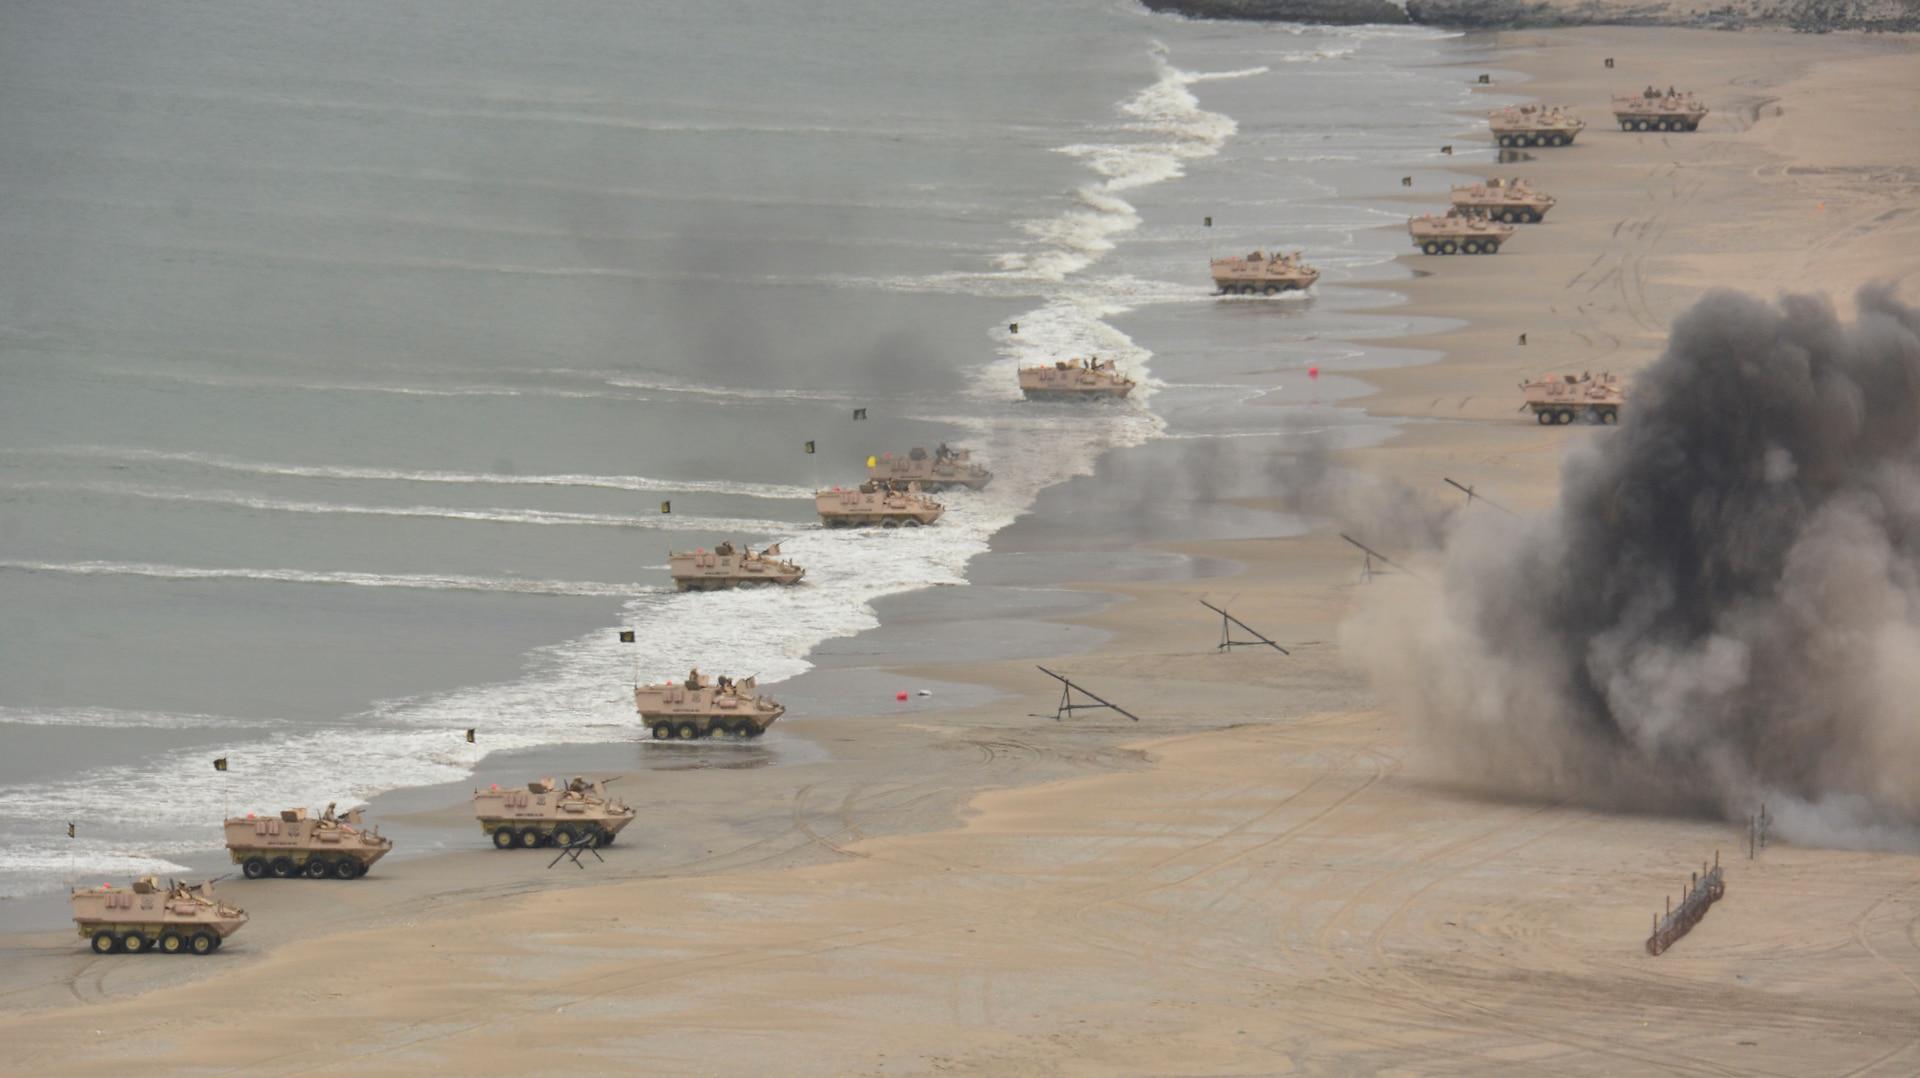 Peruvian marine amphibious assault vehicles land on Las Salinas Beach as part of the amphibious assault during UNITAS LXII.